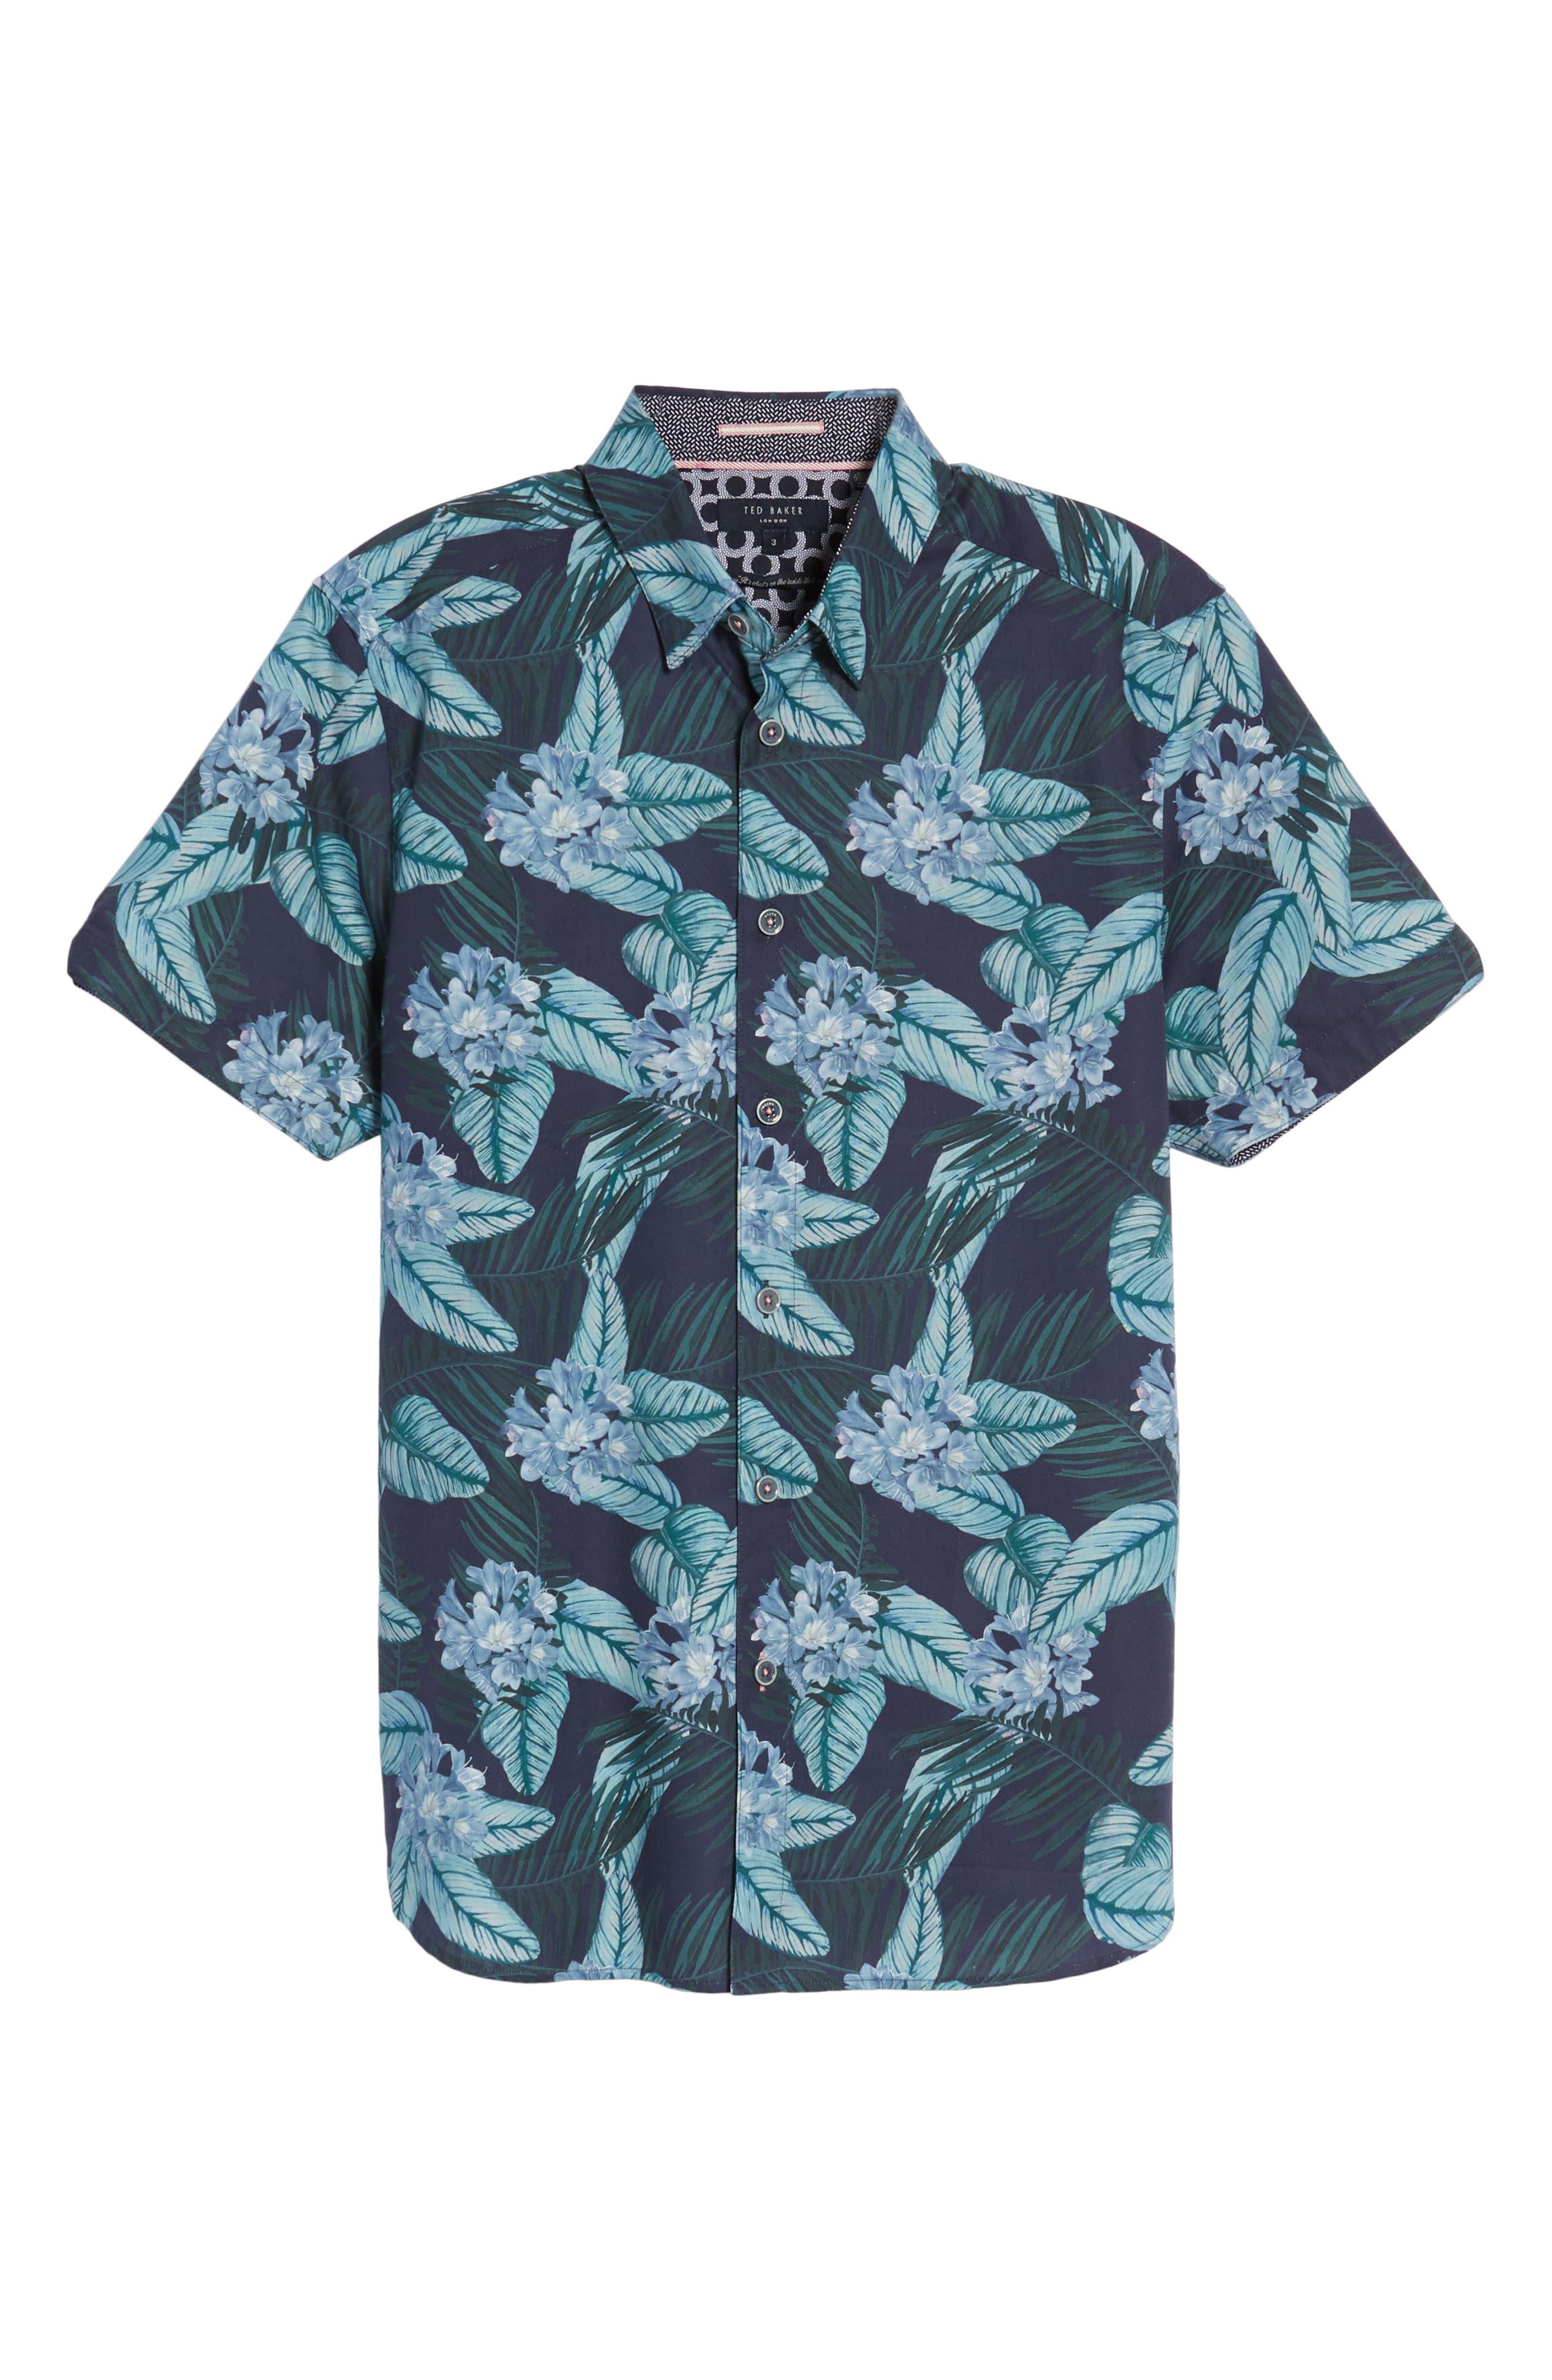 Folinor Slim Fit Floral Cotton Shirt,                             Alternate thumbnail 6, color,                             Navy